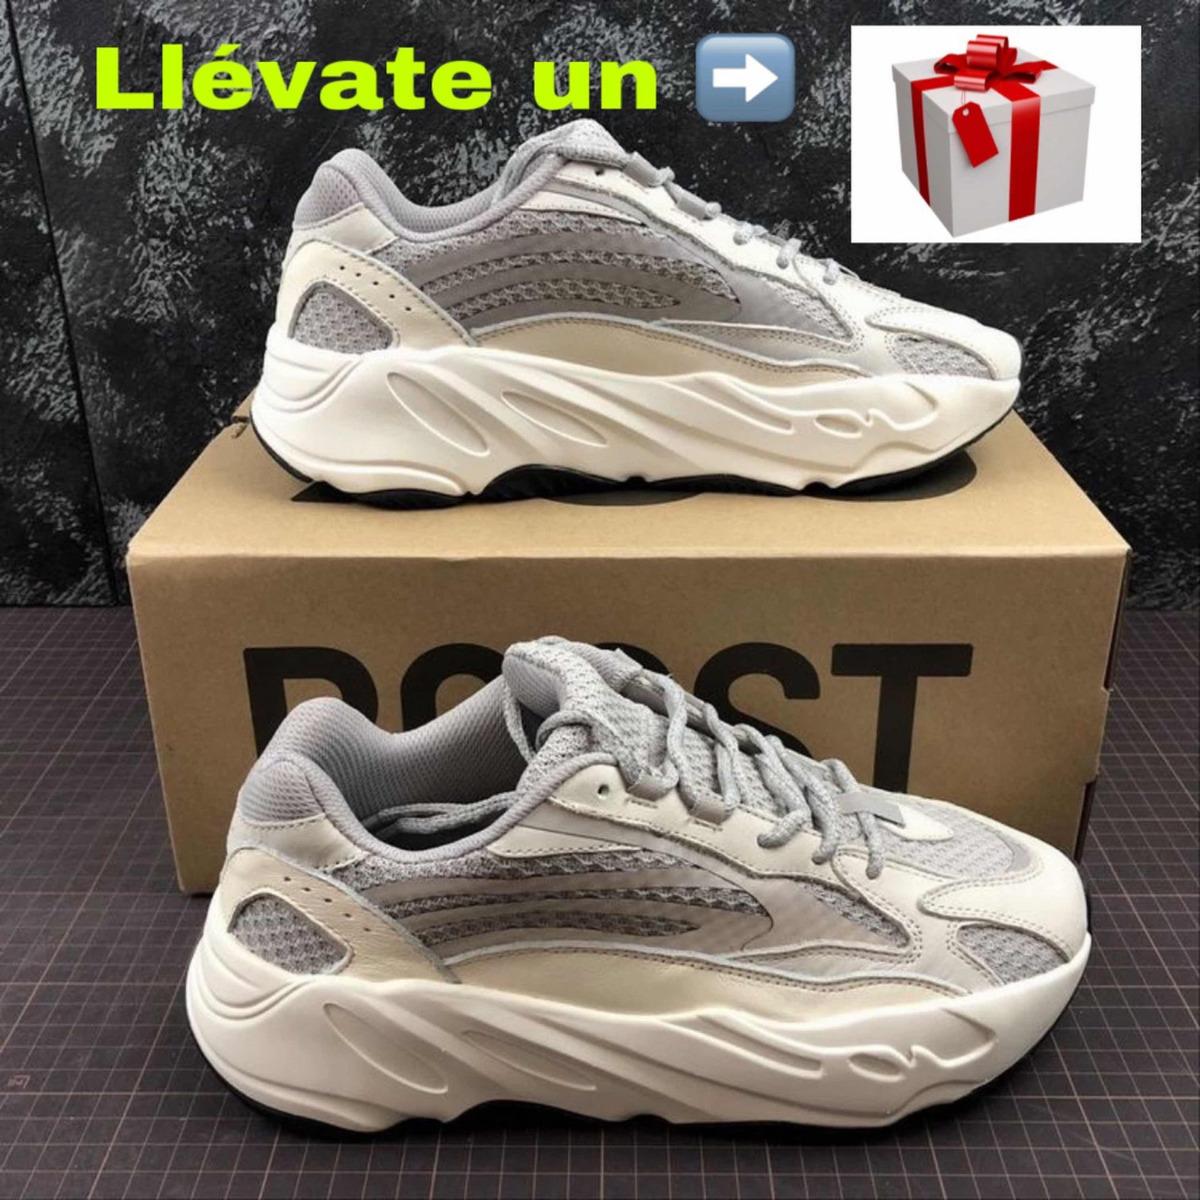 Originales Yeezy 700 1006 200 00 Adidas Boost V2 Static En erCxdoWB